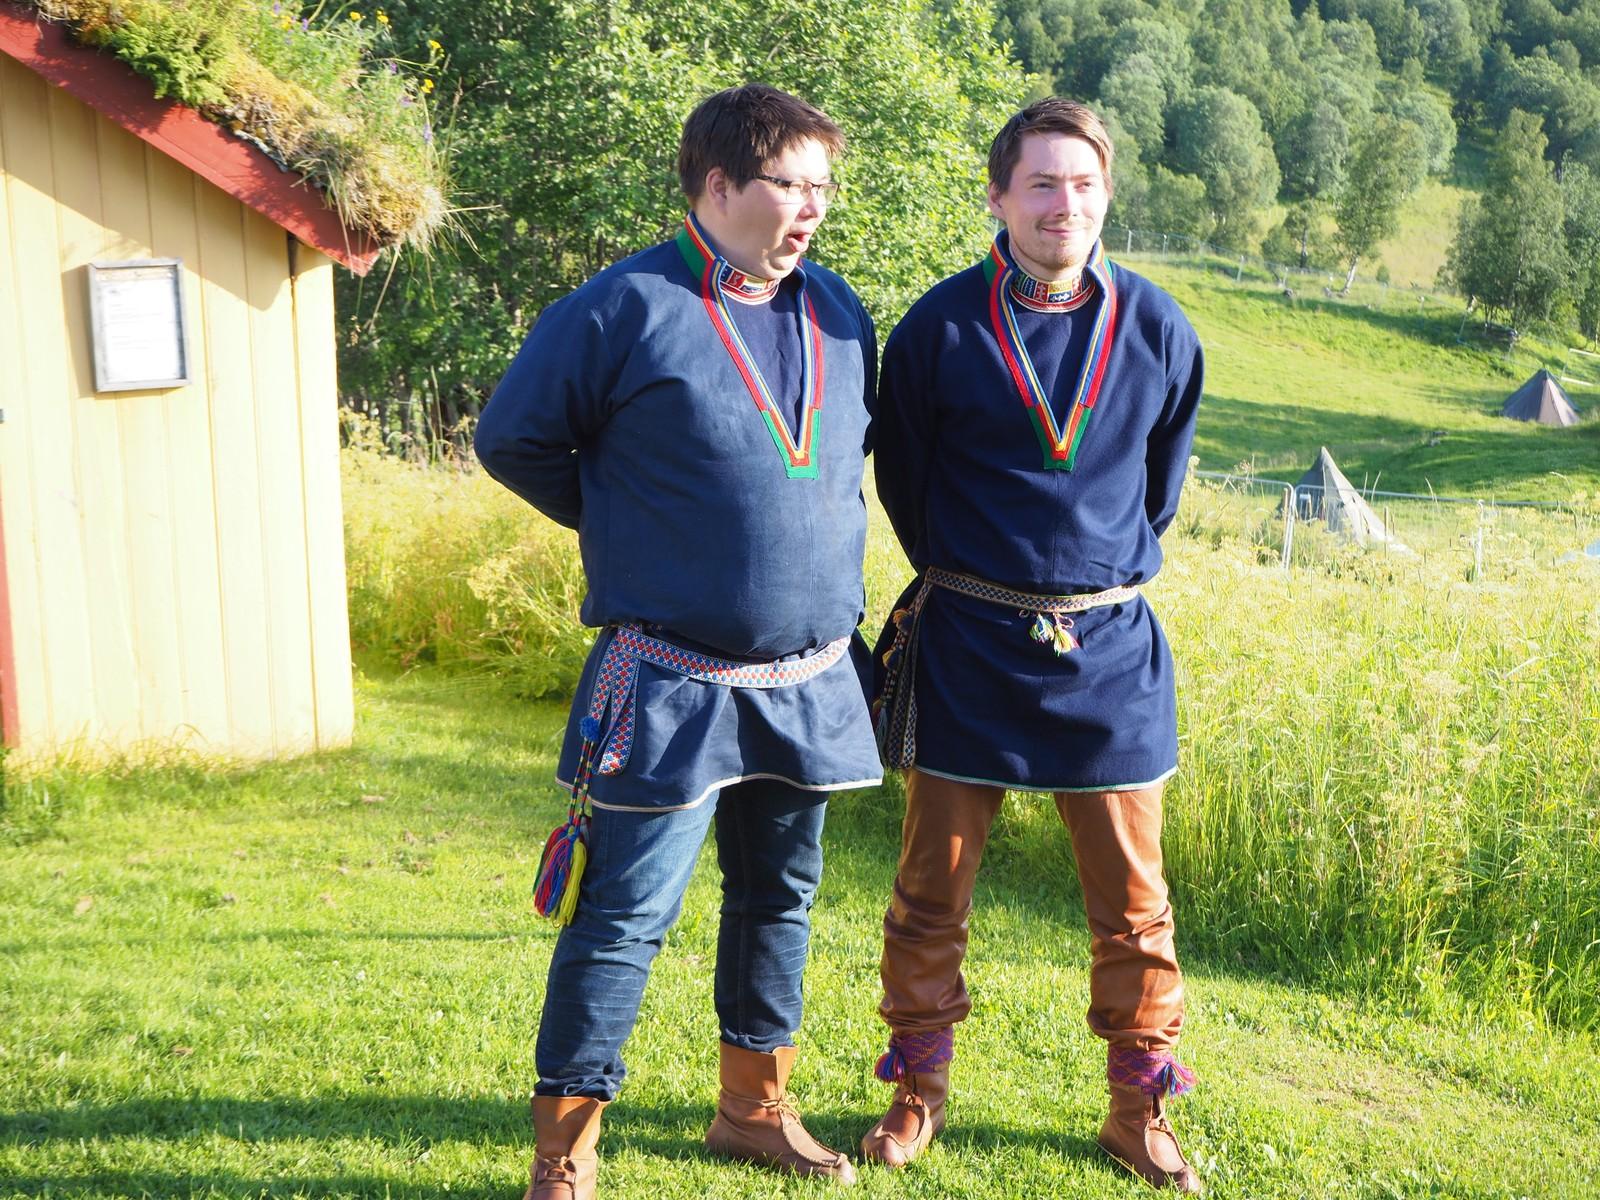 Brødrene Jon Isak Gælok og Thomas Gælok joiket under åpningen